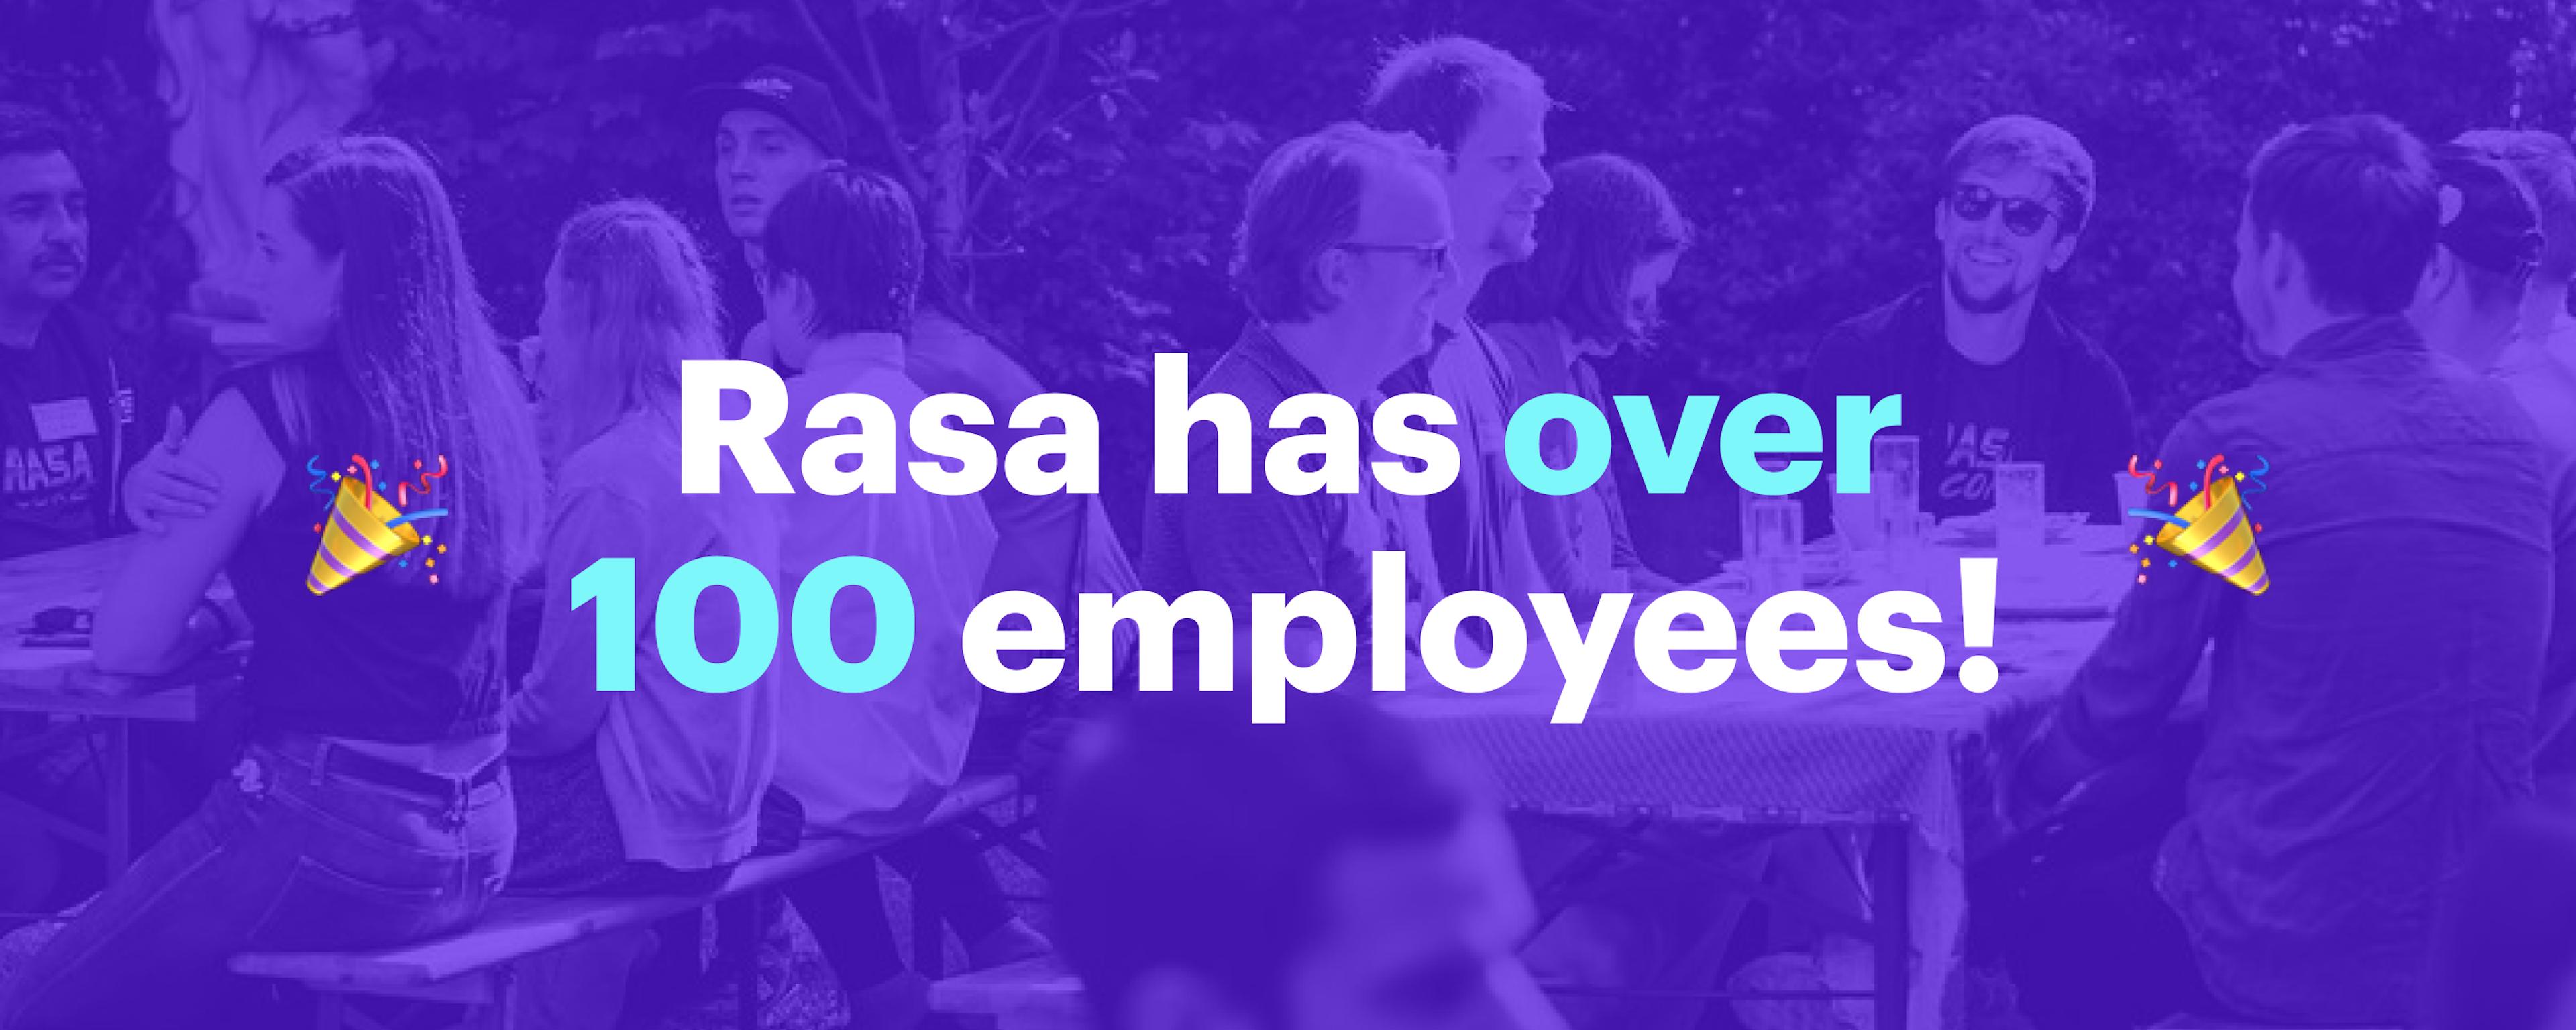 Rasa_Employee-Growth 21_blog post header